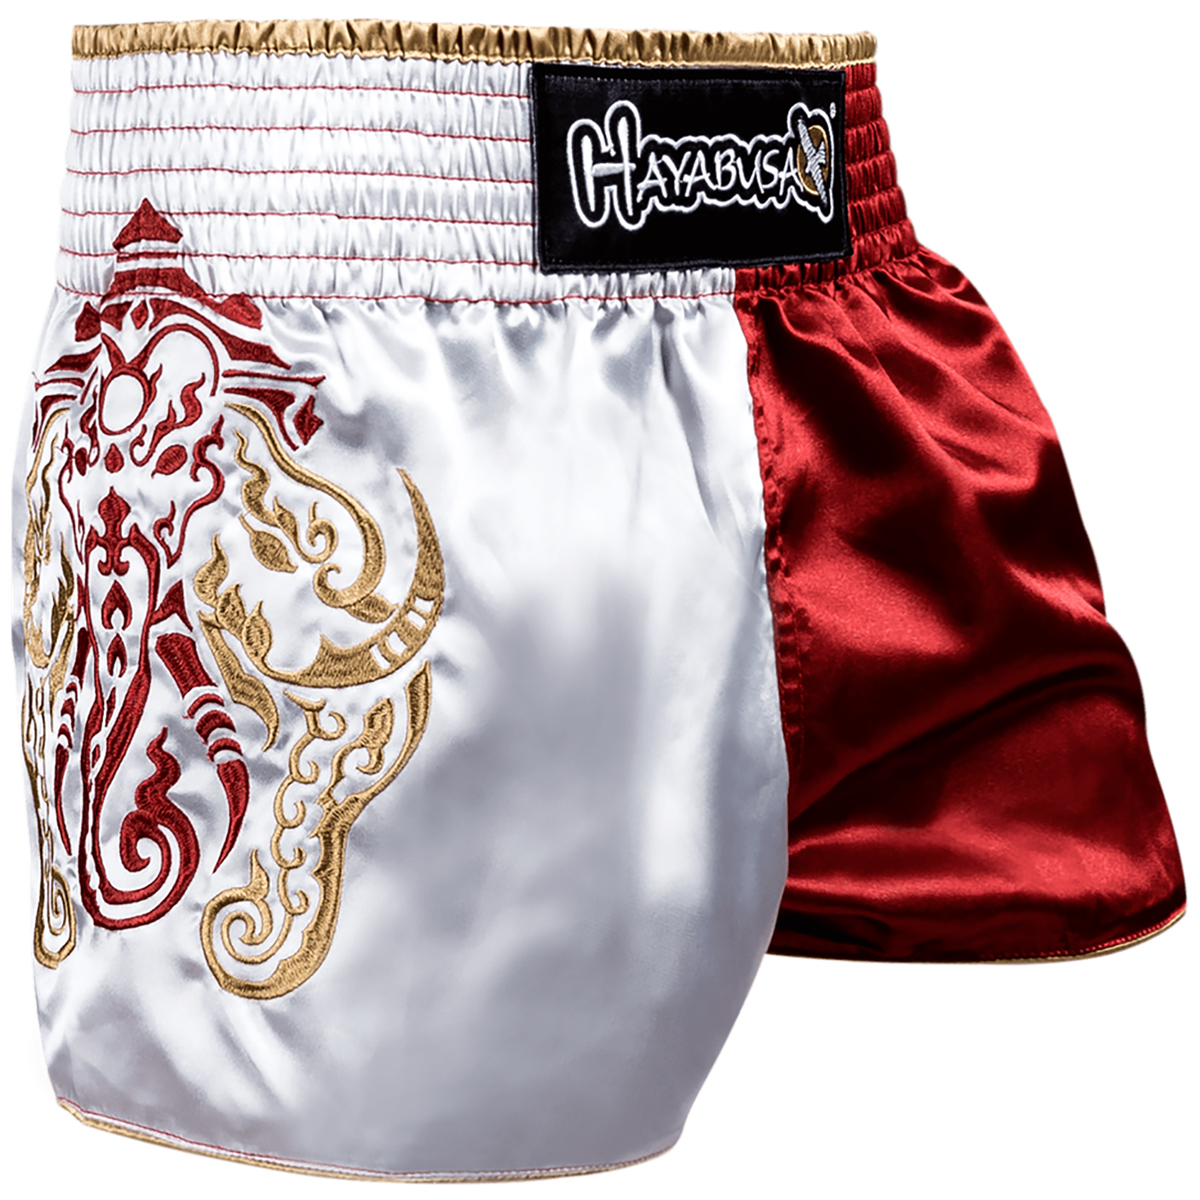 Hayabusa-Wisdom-Muay-Thai-Fight-Shorts miniature 10